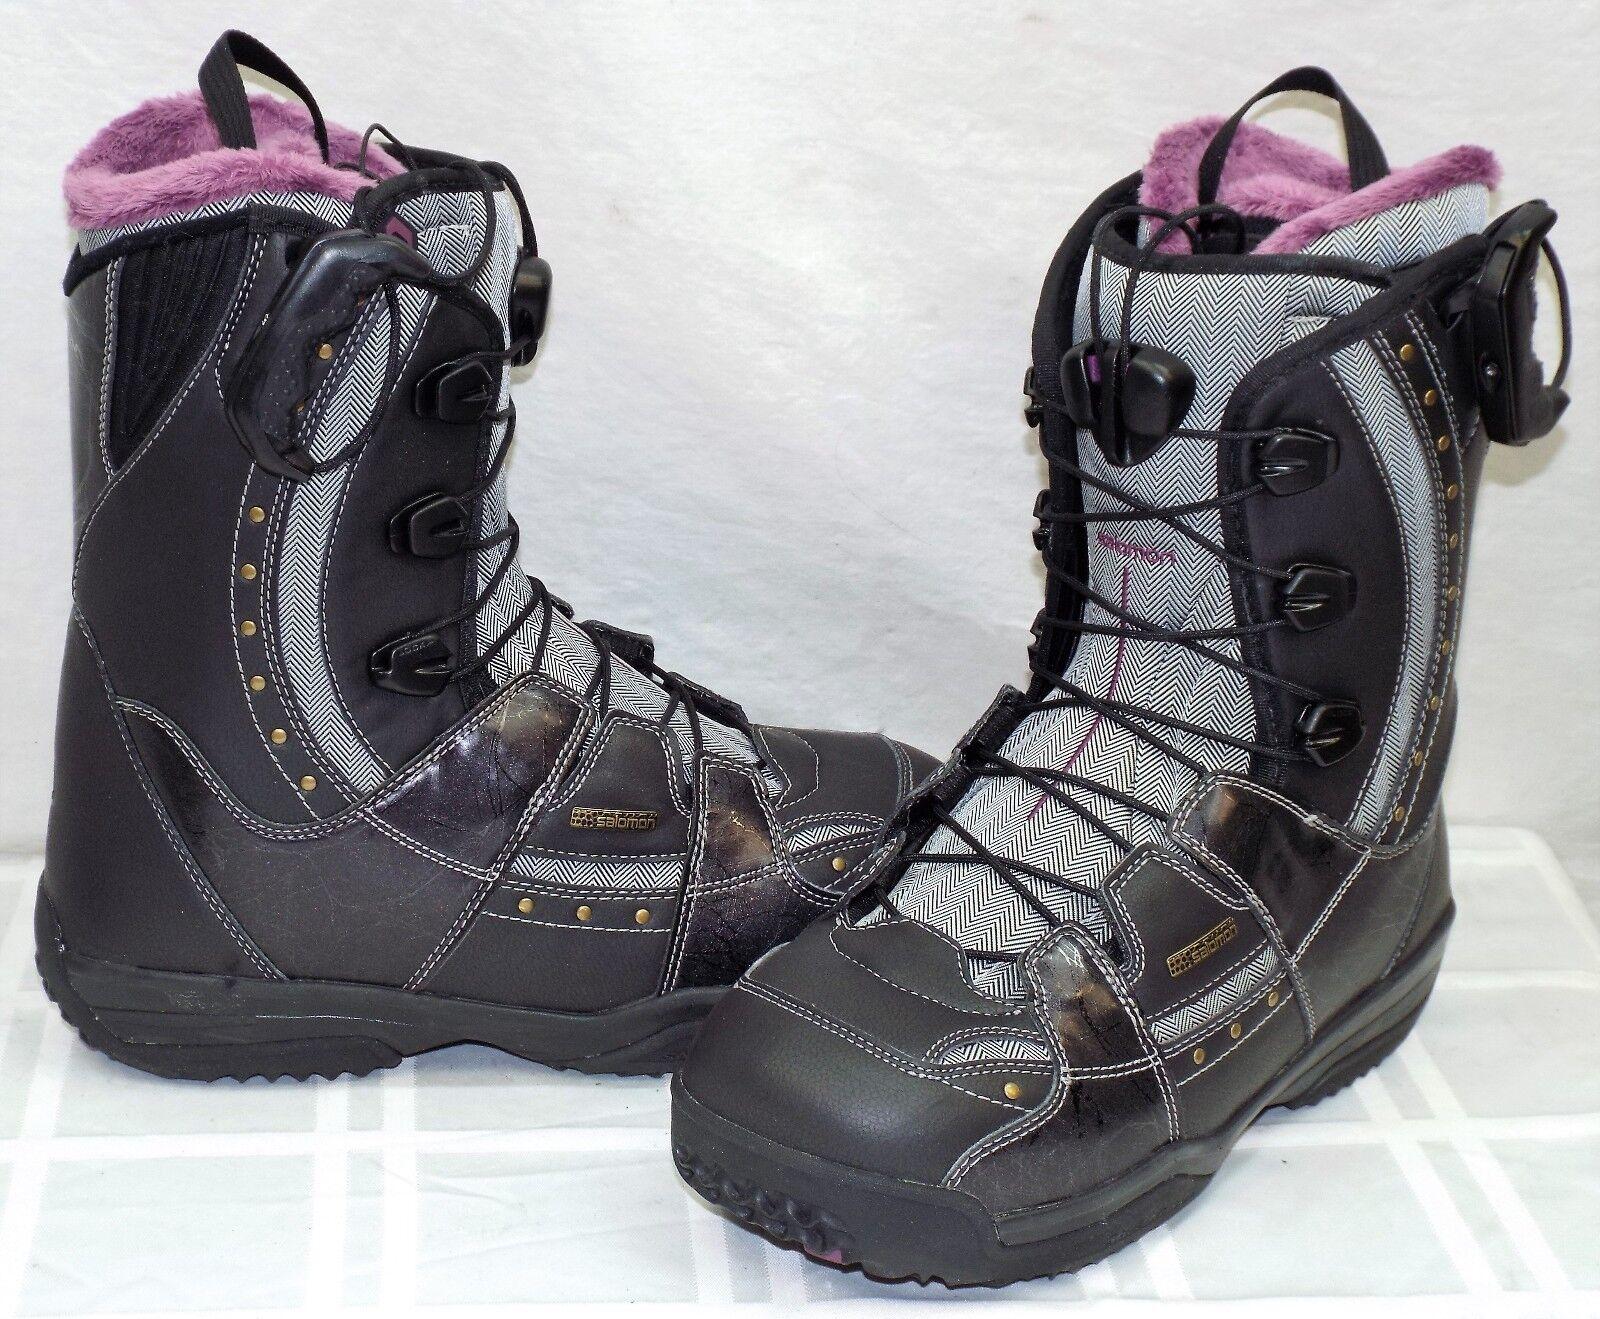 Salomon Kiana New Women's Snowboard Boots Size  9  hot sales